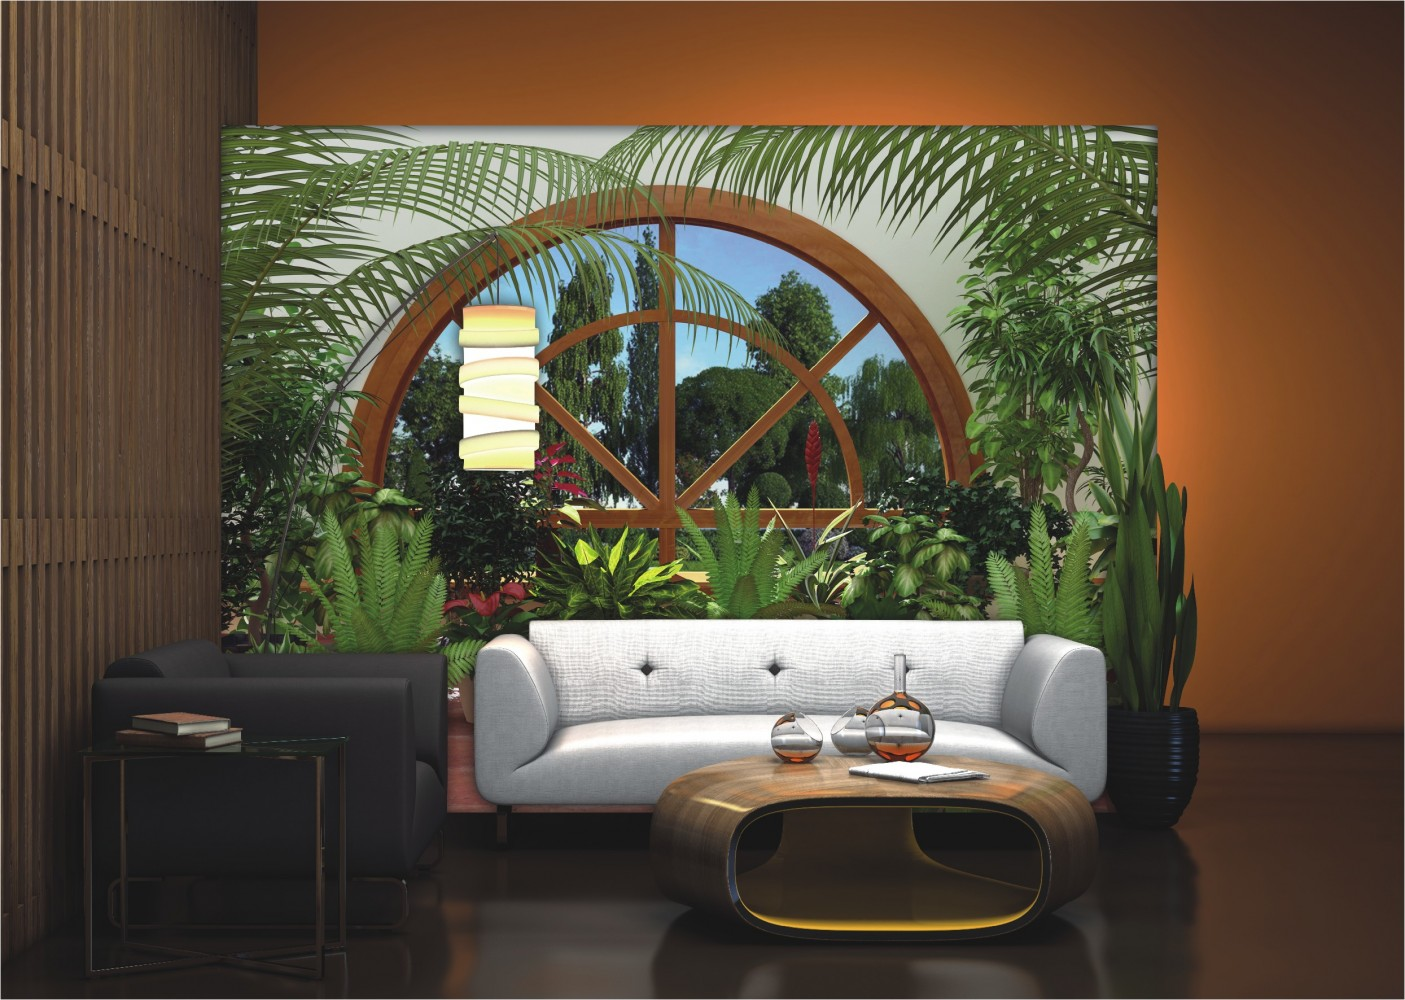 fototapete tapete natur blumen pflanzen wintergarten foto 360 cm x 254 cm gr n. Black Bedroom Furniture Sets. Home Design Ideas